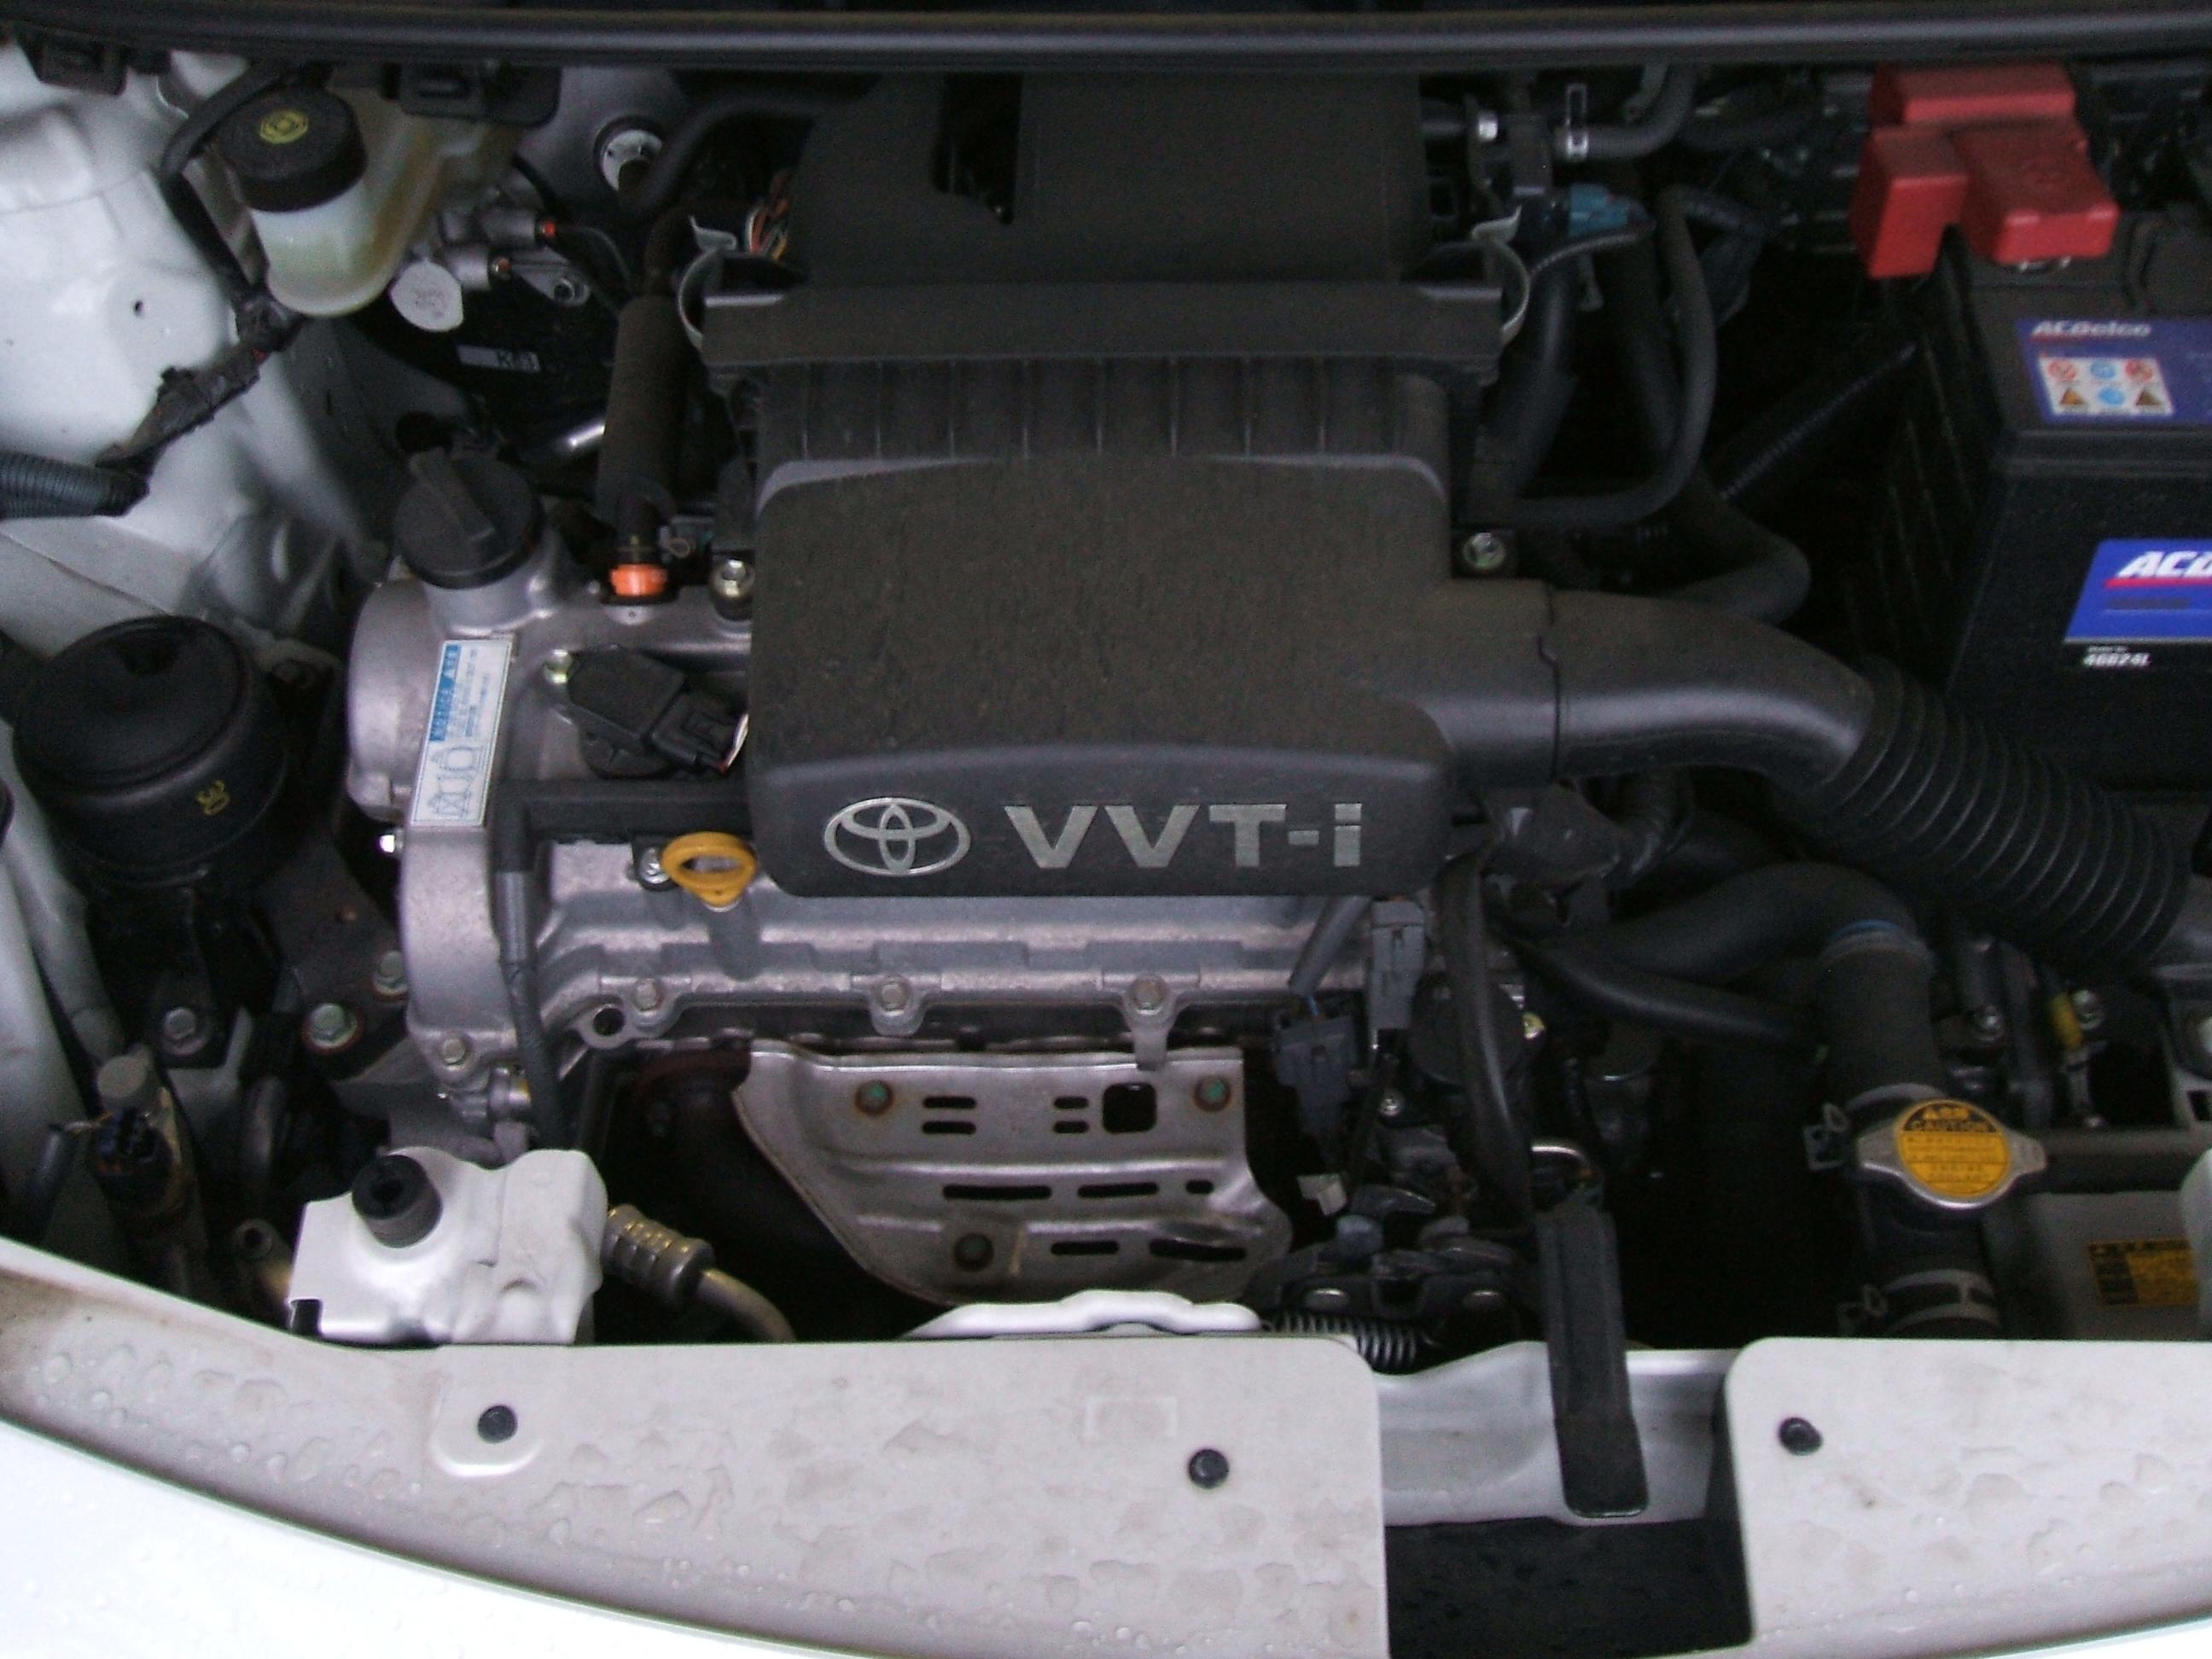 File:Toyota 2SZ-FE engine jpg - Wikimedia Commons